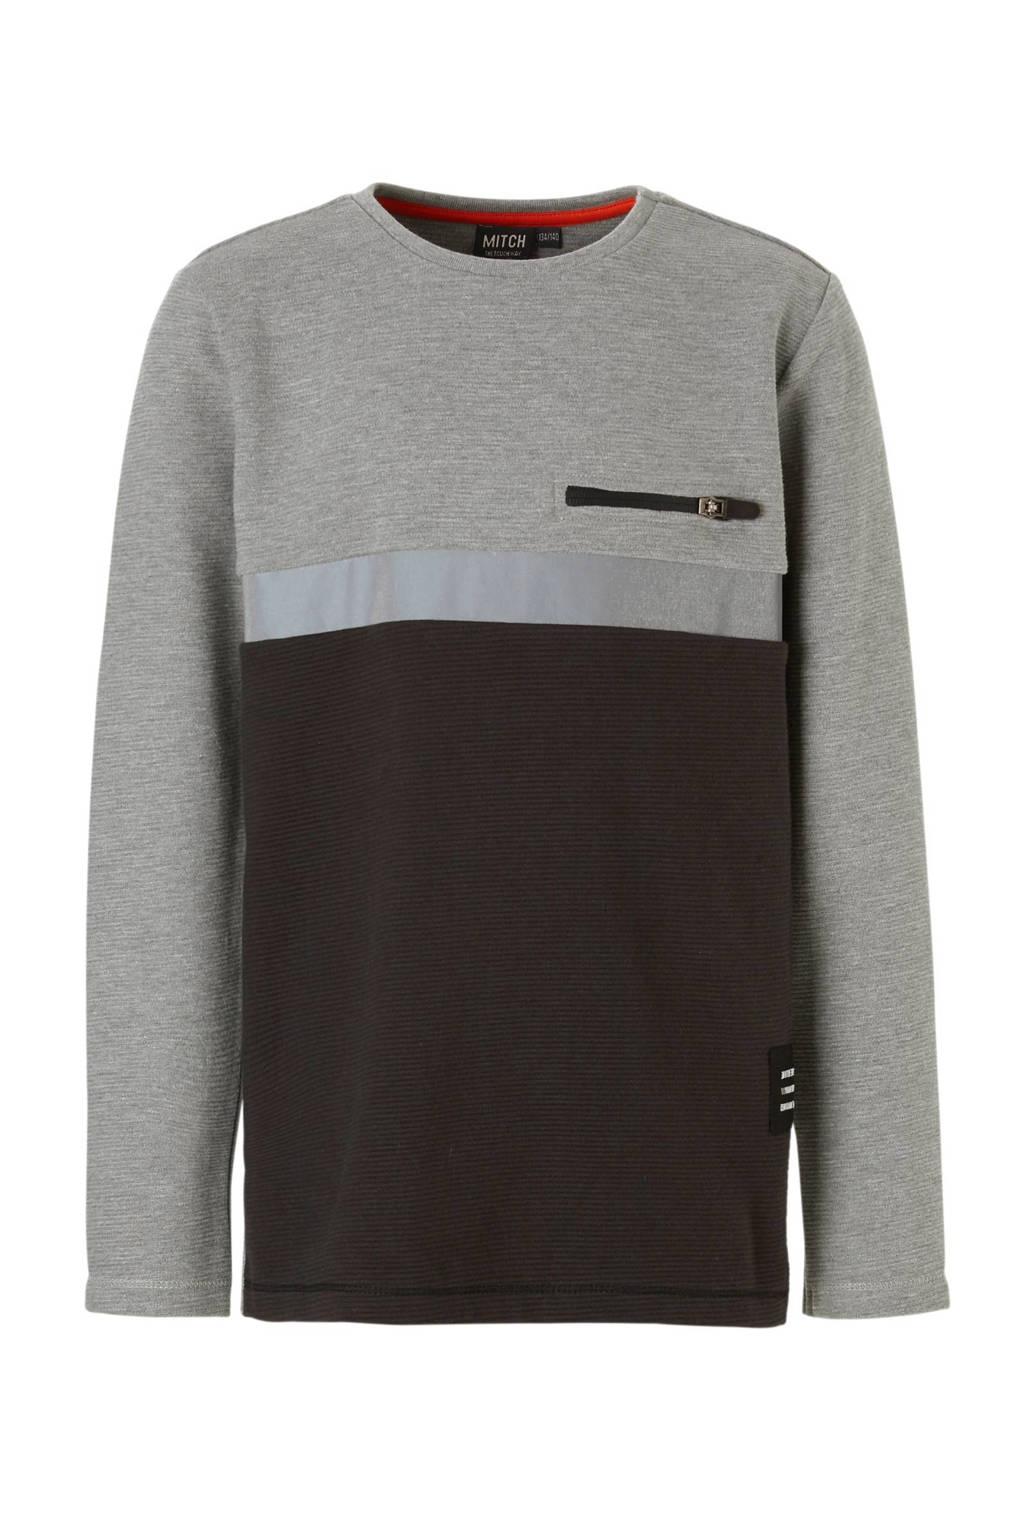 Mitch sweater Djay grijs, Grijs/zwart